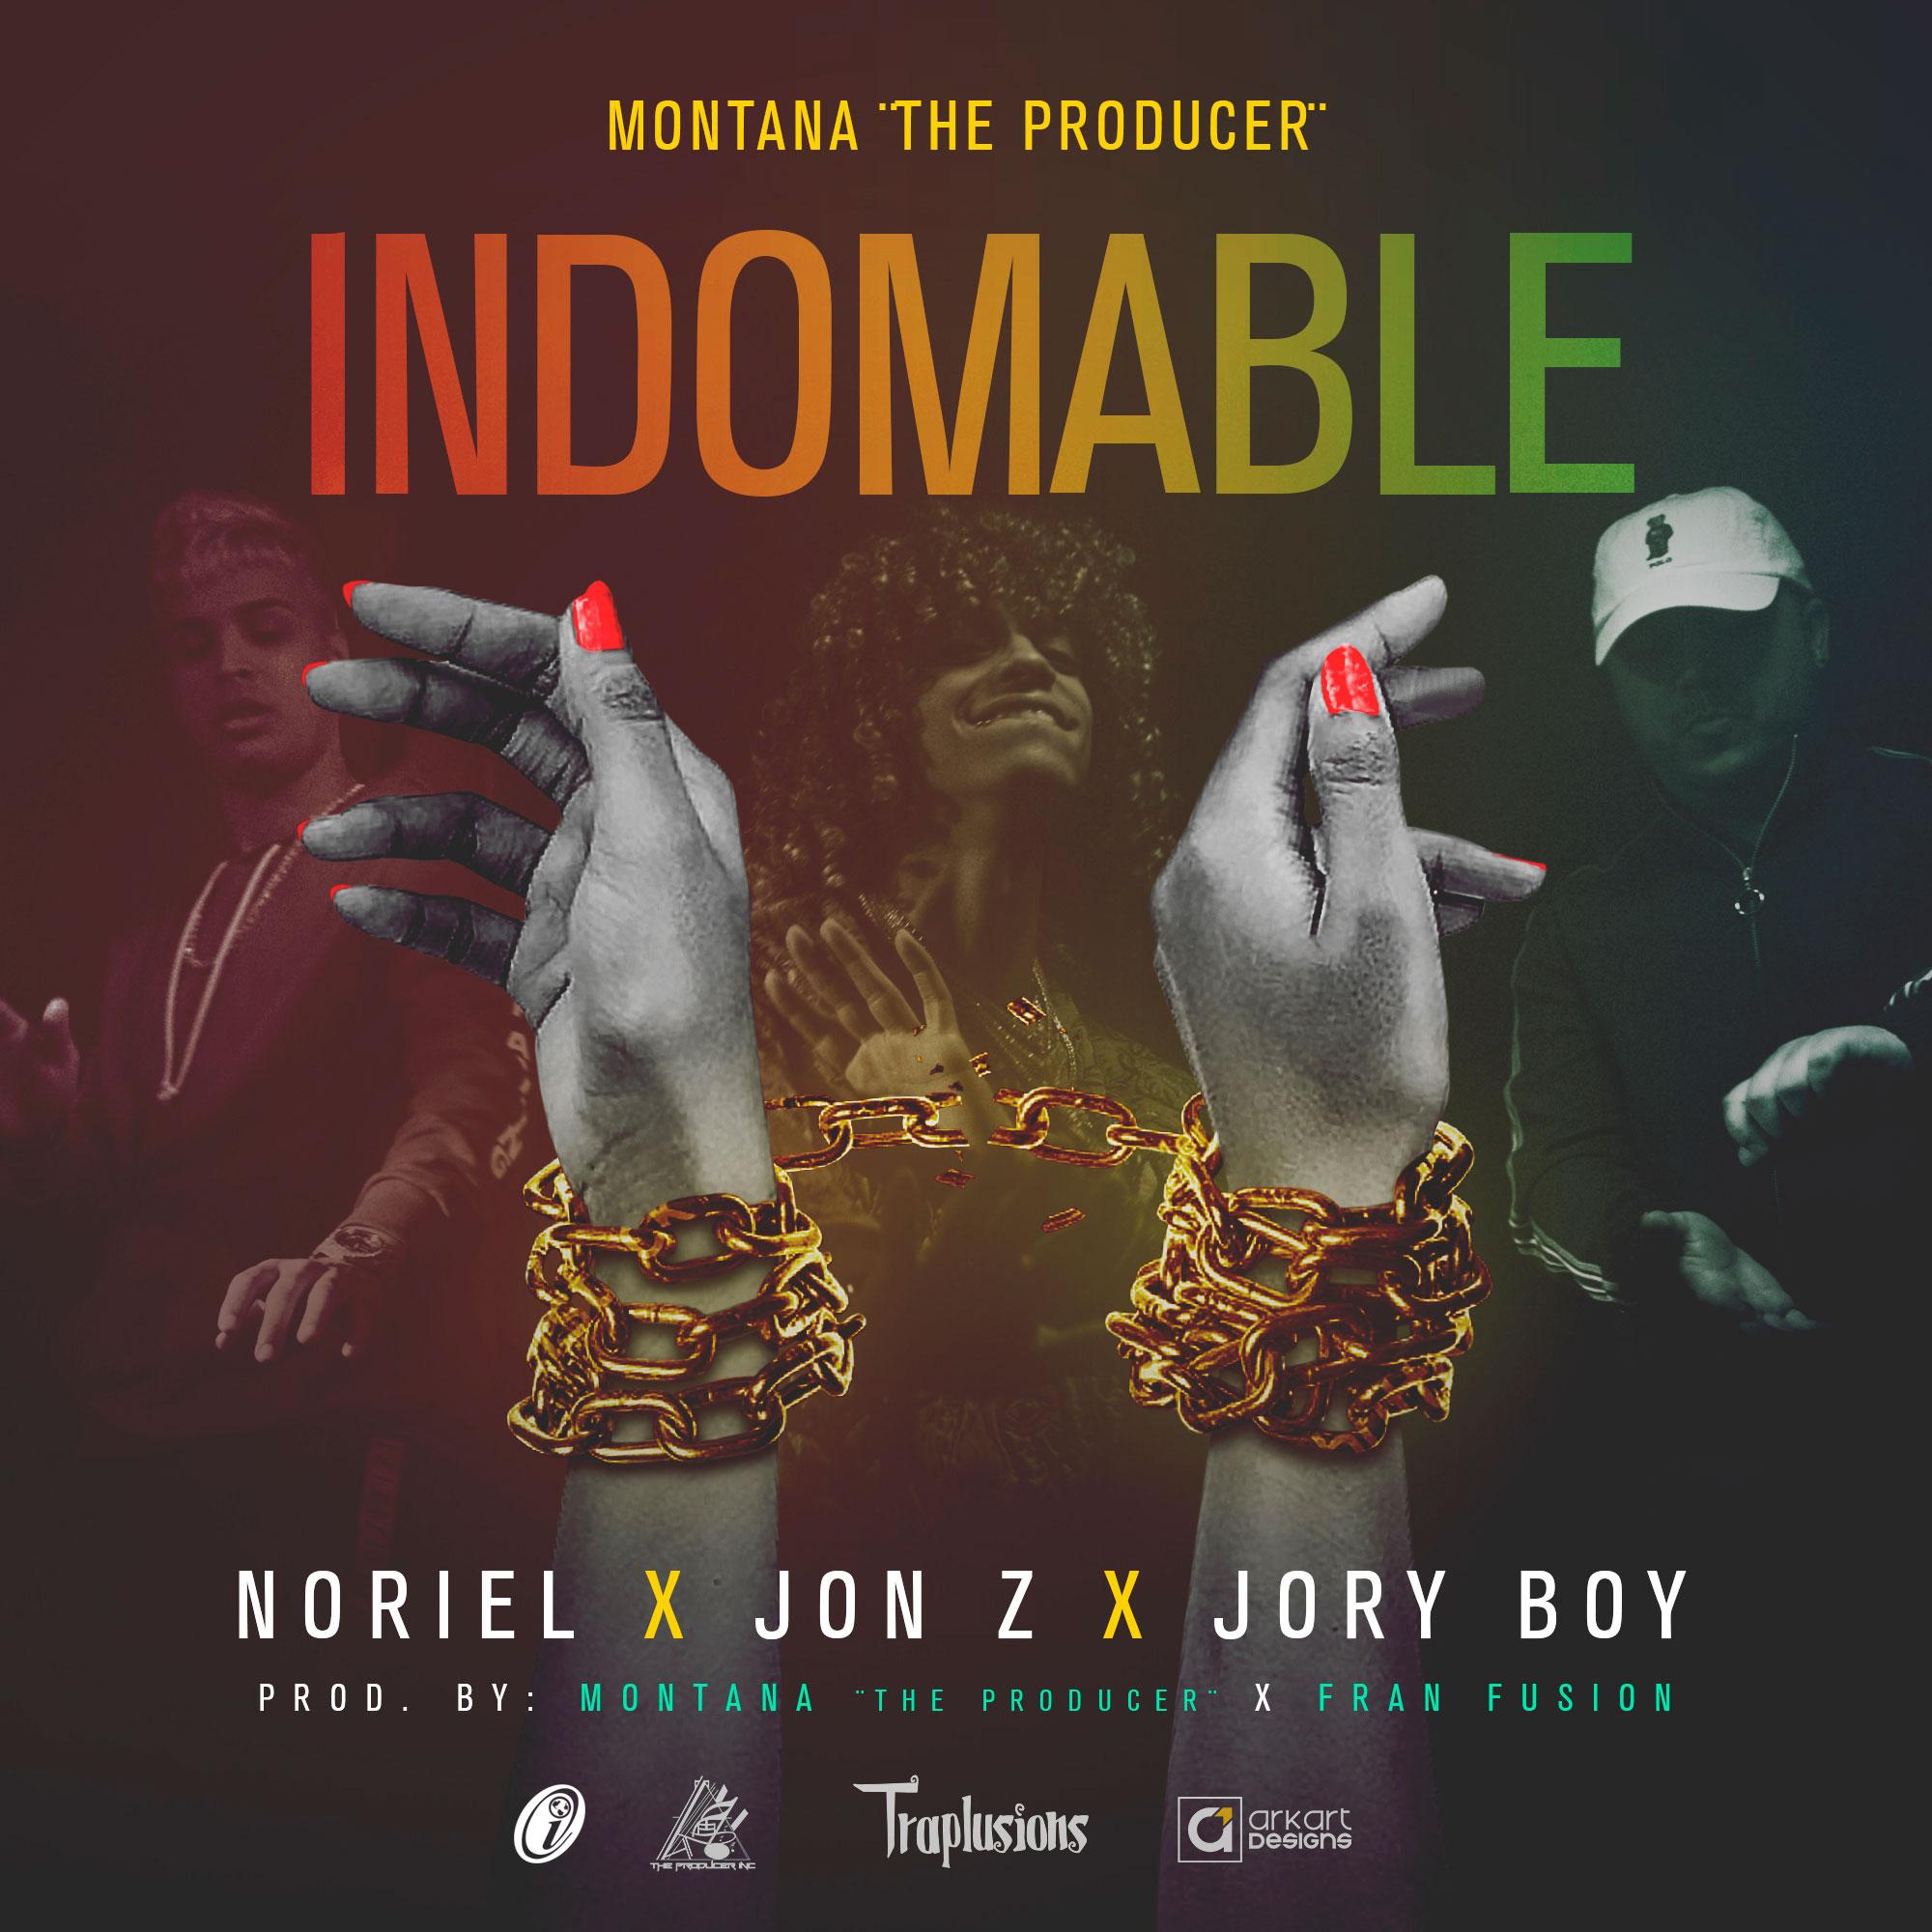 NORIEL x JON Z x JORY BOY – INDOMABLE (OFFICIAL VIDEO)